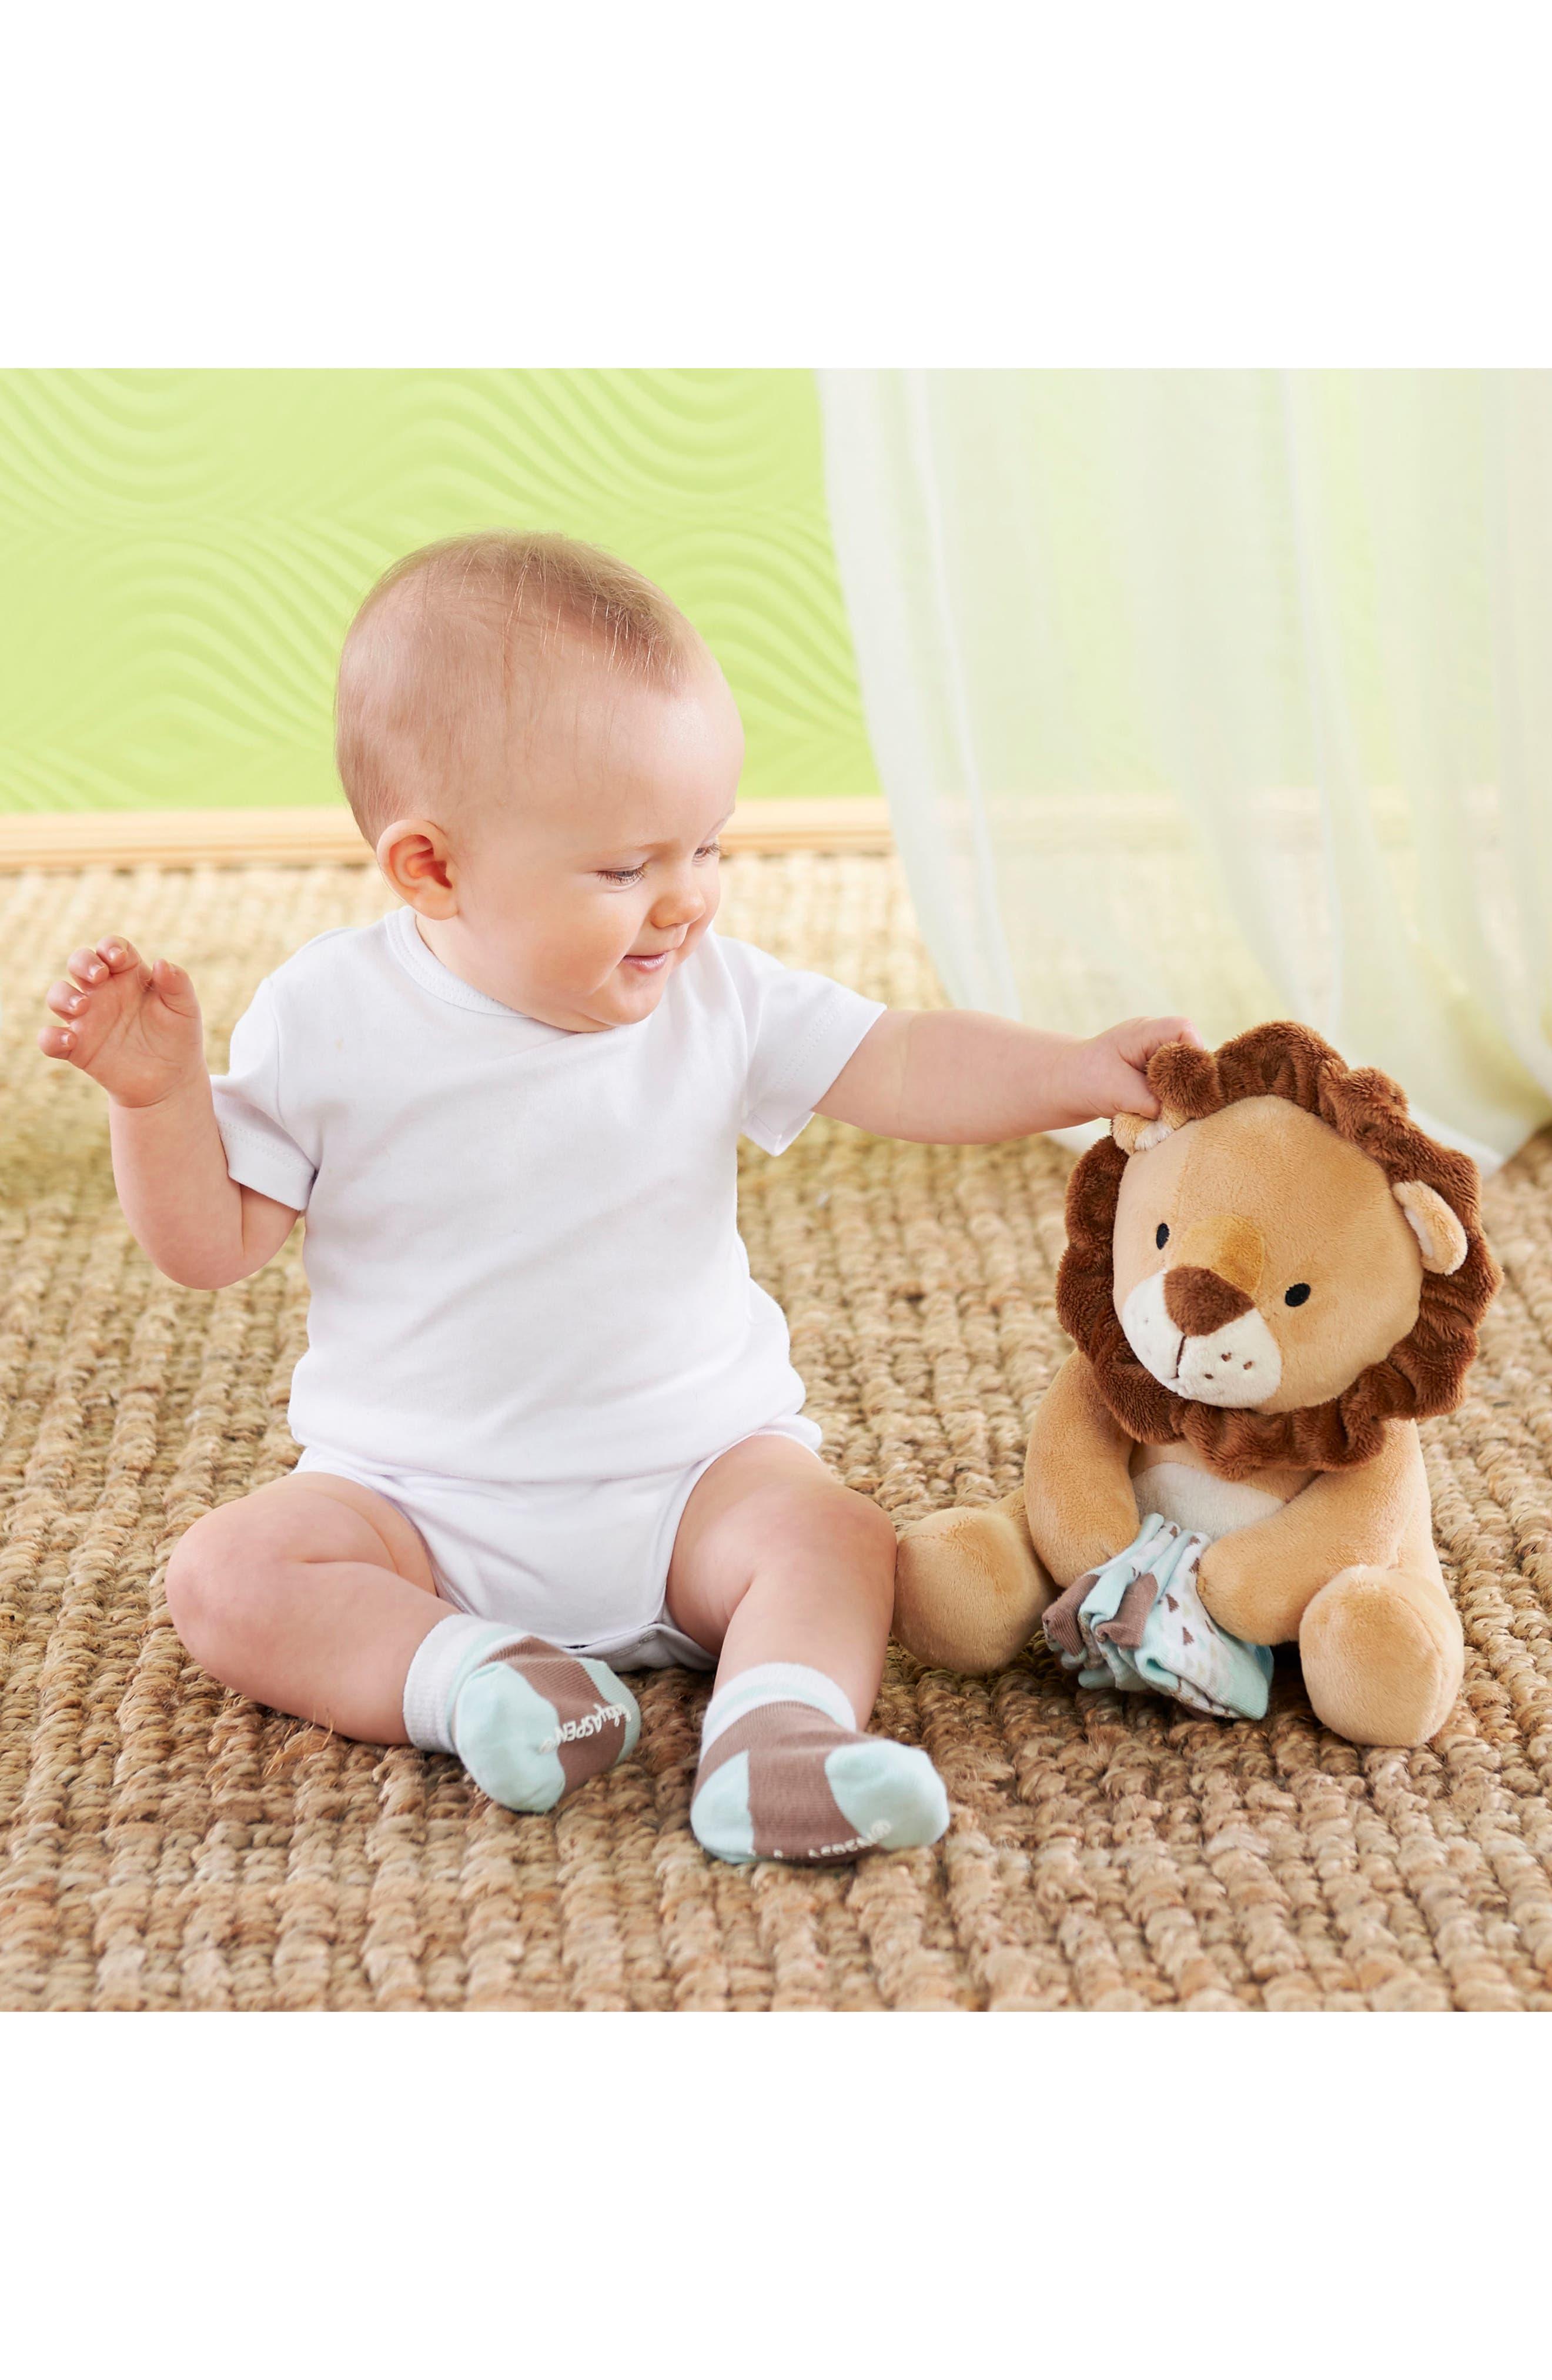 Lion Safari Hooded Blanket, 3-Pack Socks & Stuffed Animal Set,                             Alternate thumbnail 2, color,                             200